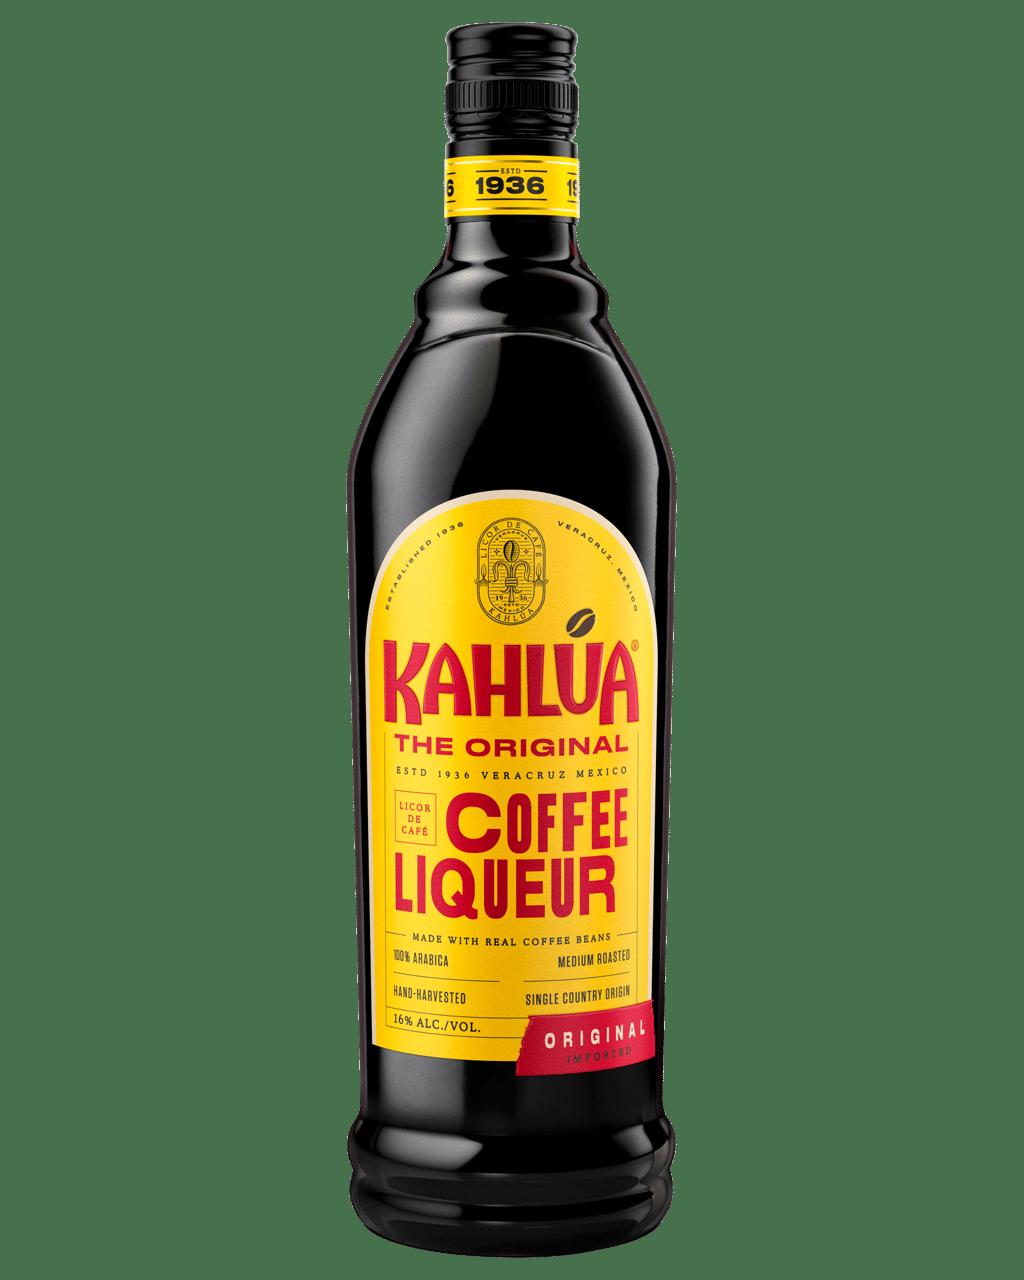 Kahlua Alcohol Content